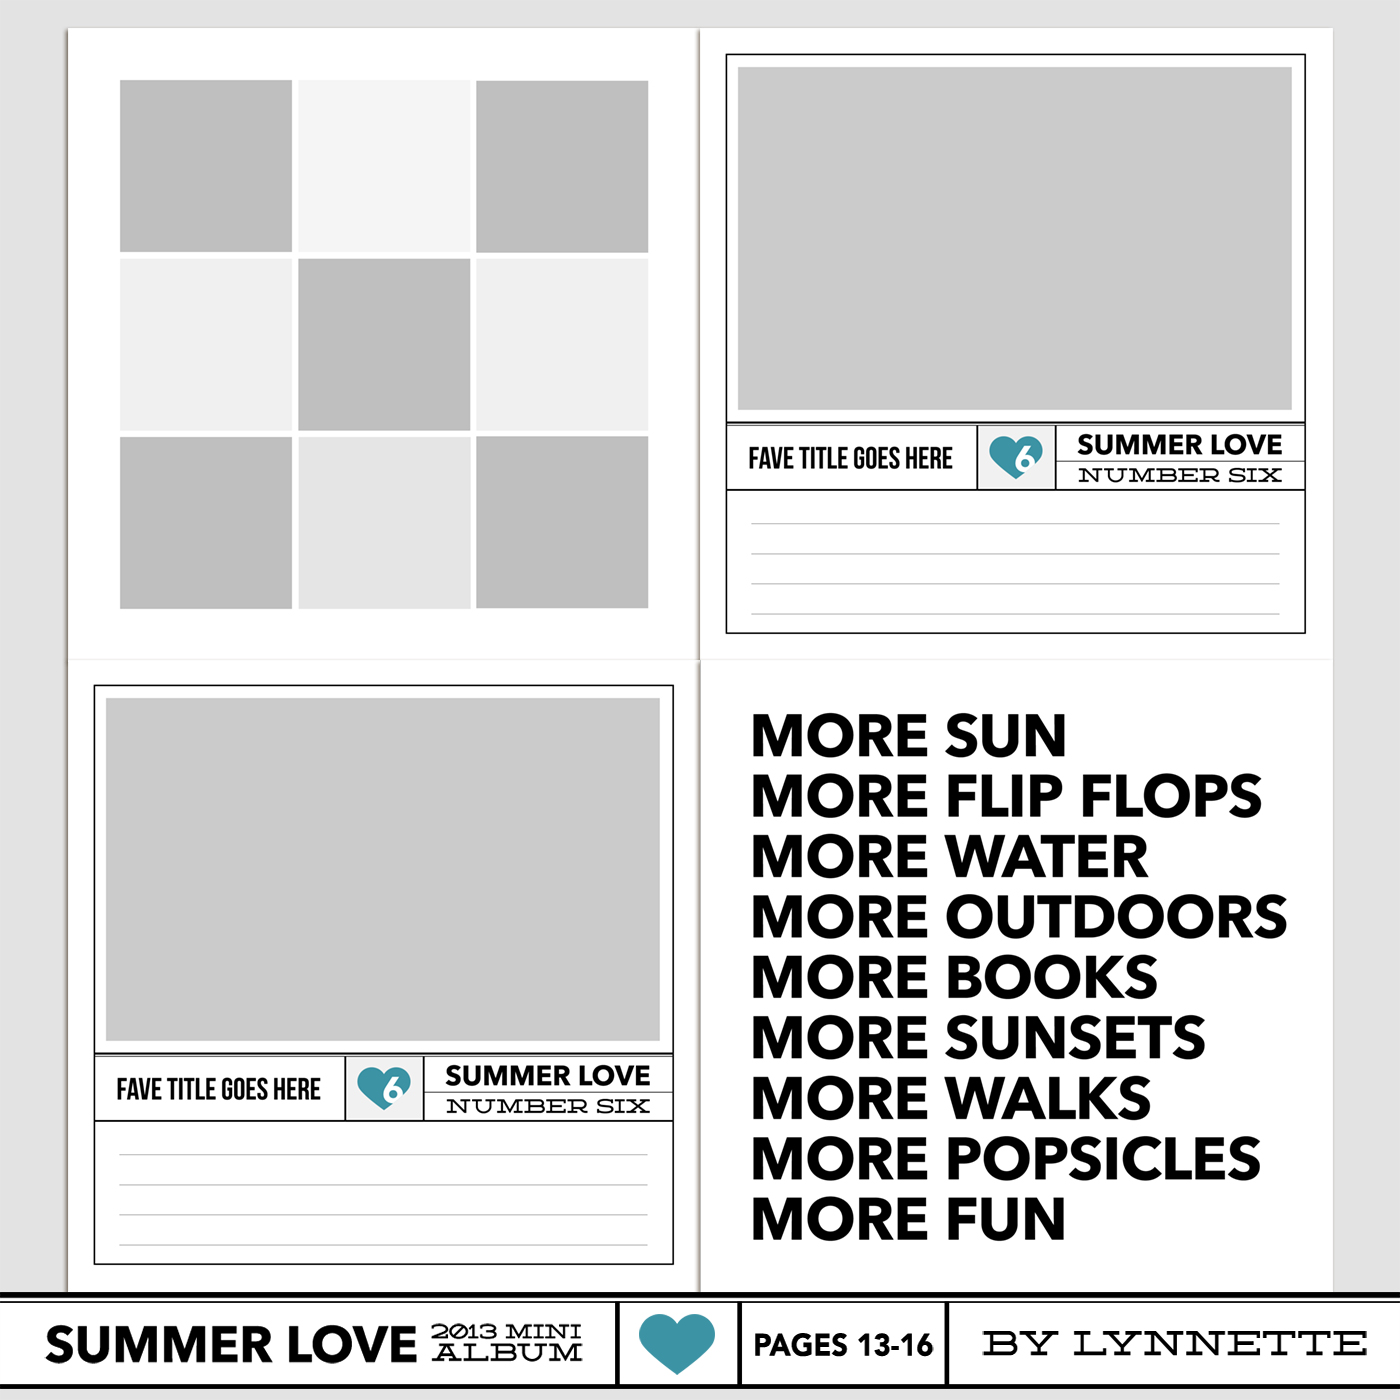 nettiodesigns_SummerLove-pg13-16-templates